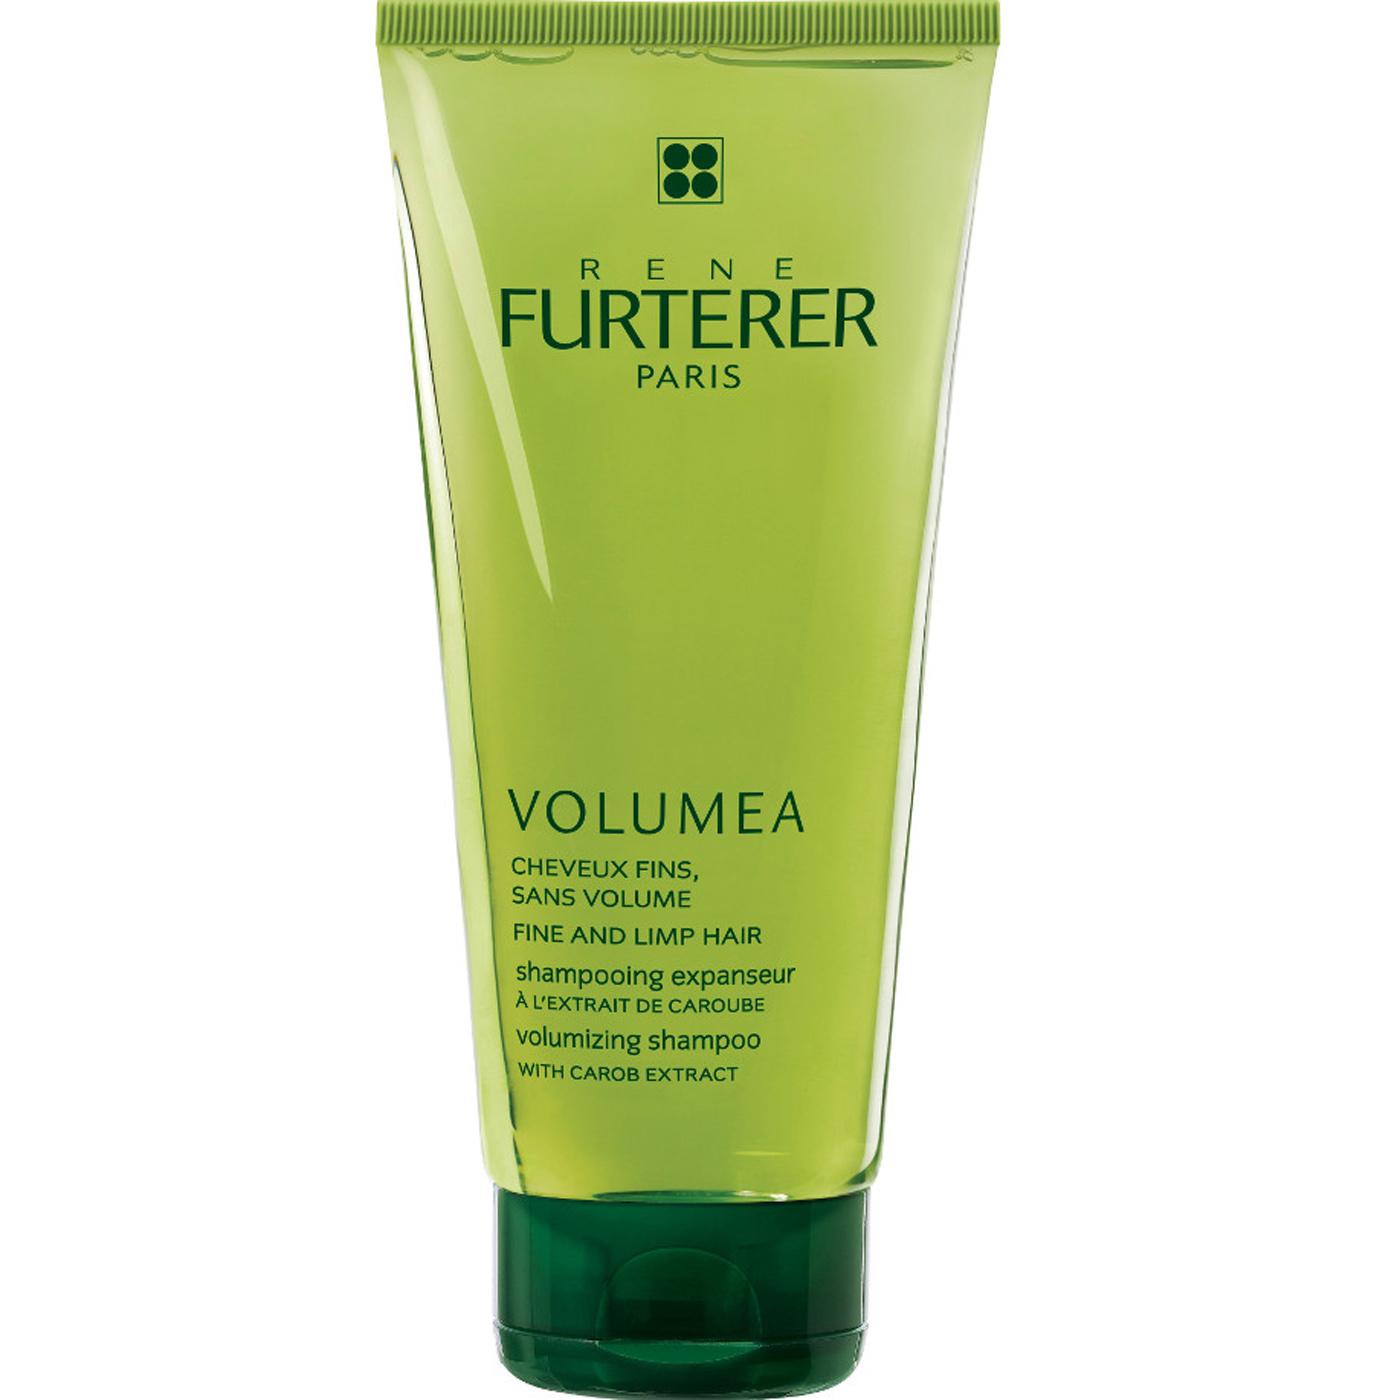 Rene Furterer Volumea Shampoo Σαμπουάν για Όγκο 200ml